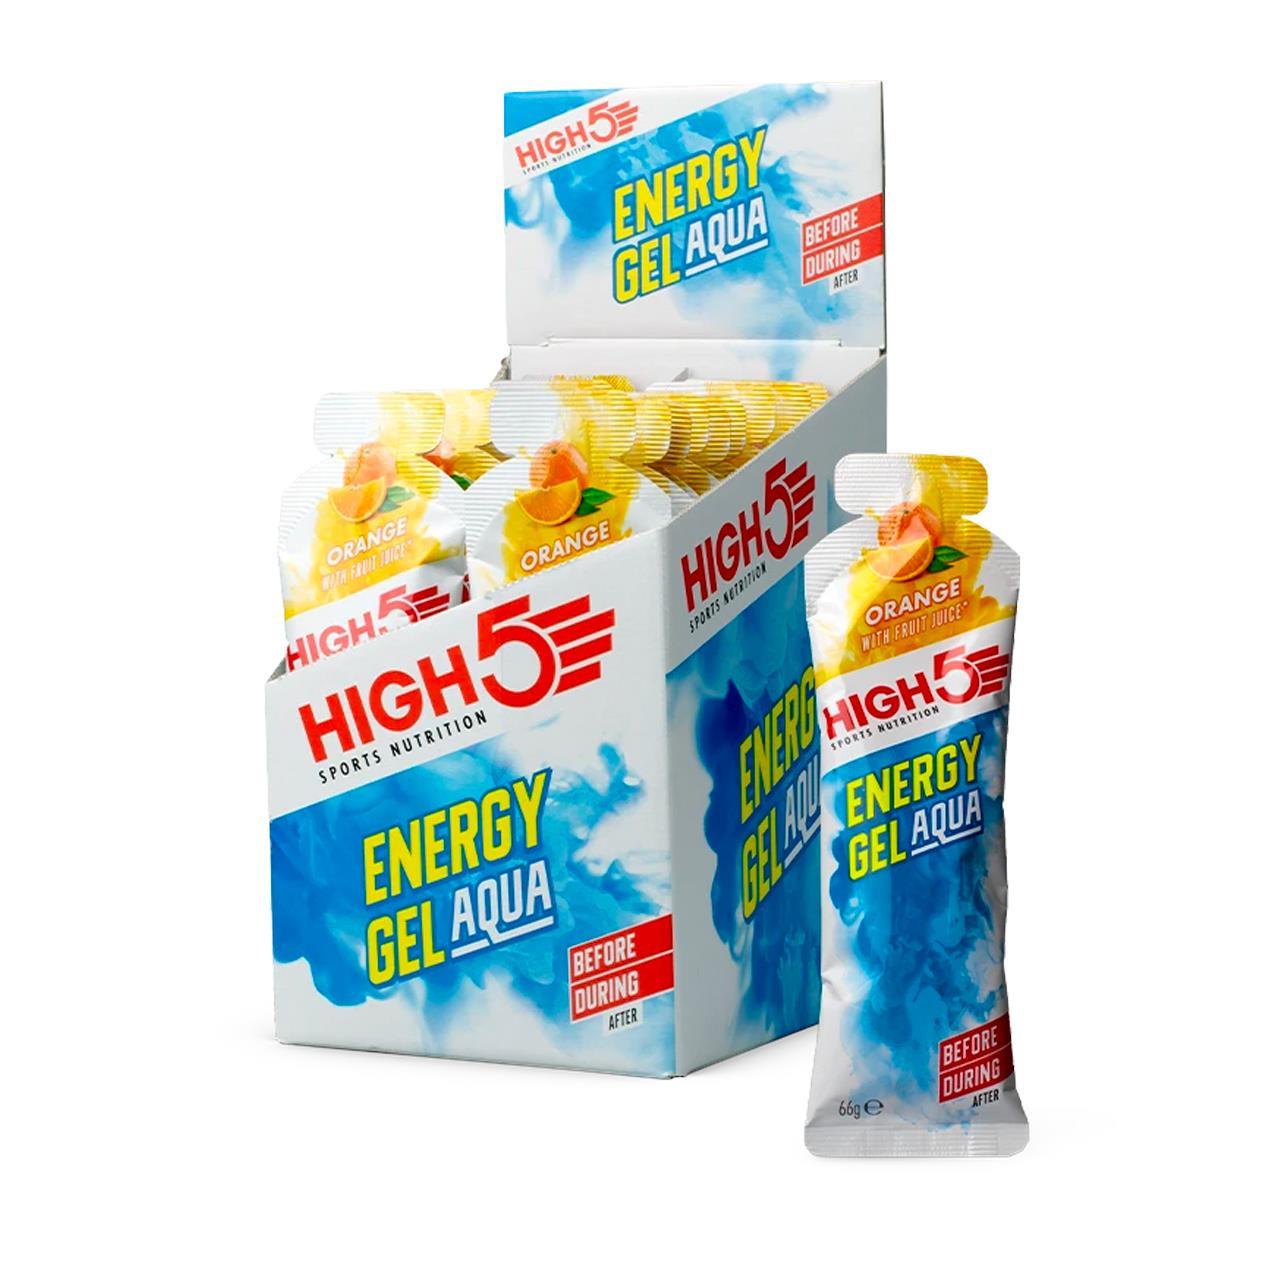 High5 Energy Gel Aqua, 20 Pack (Orange)